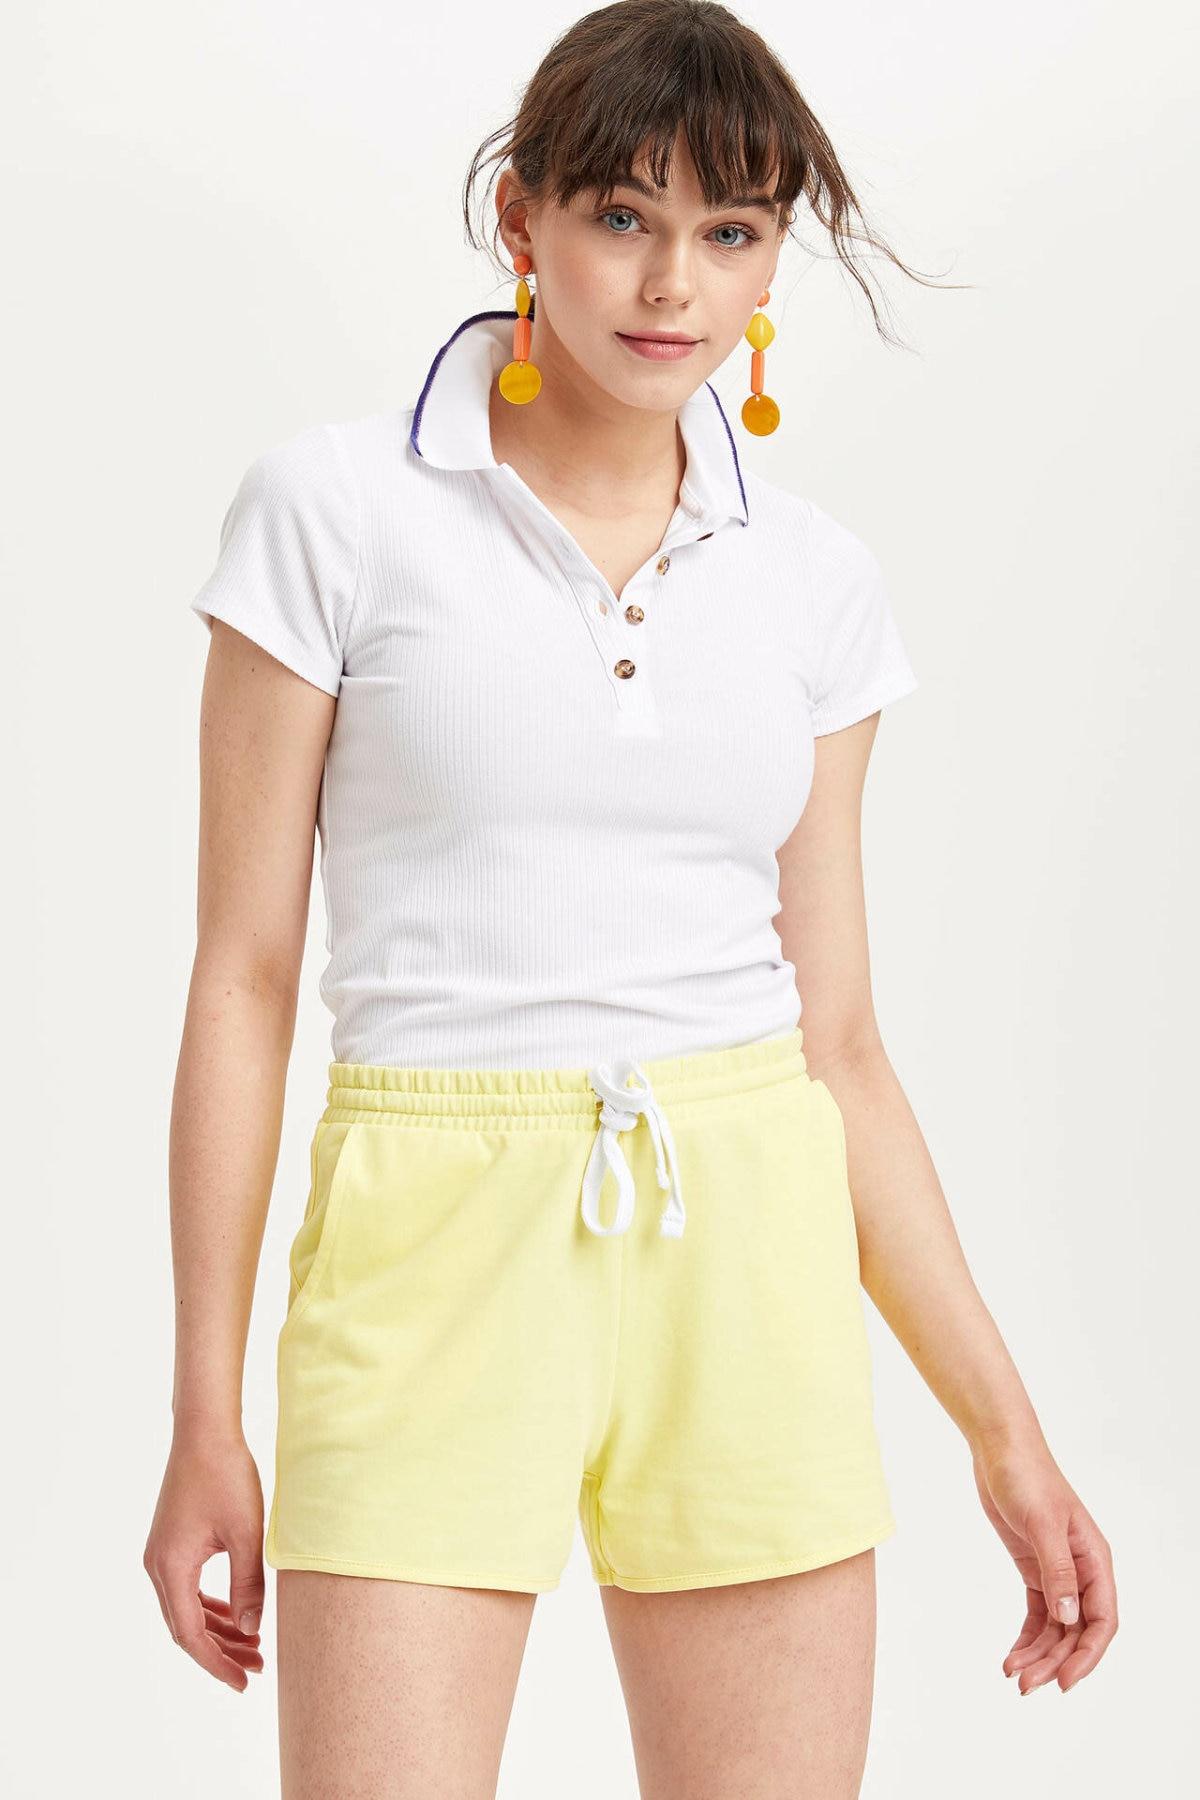 DeFacto Woman Light Yellow Elastic Short Women Summer Shorts Female Sports Shorts-K8634AZ19SM